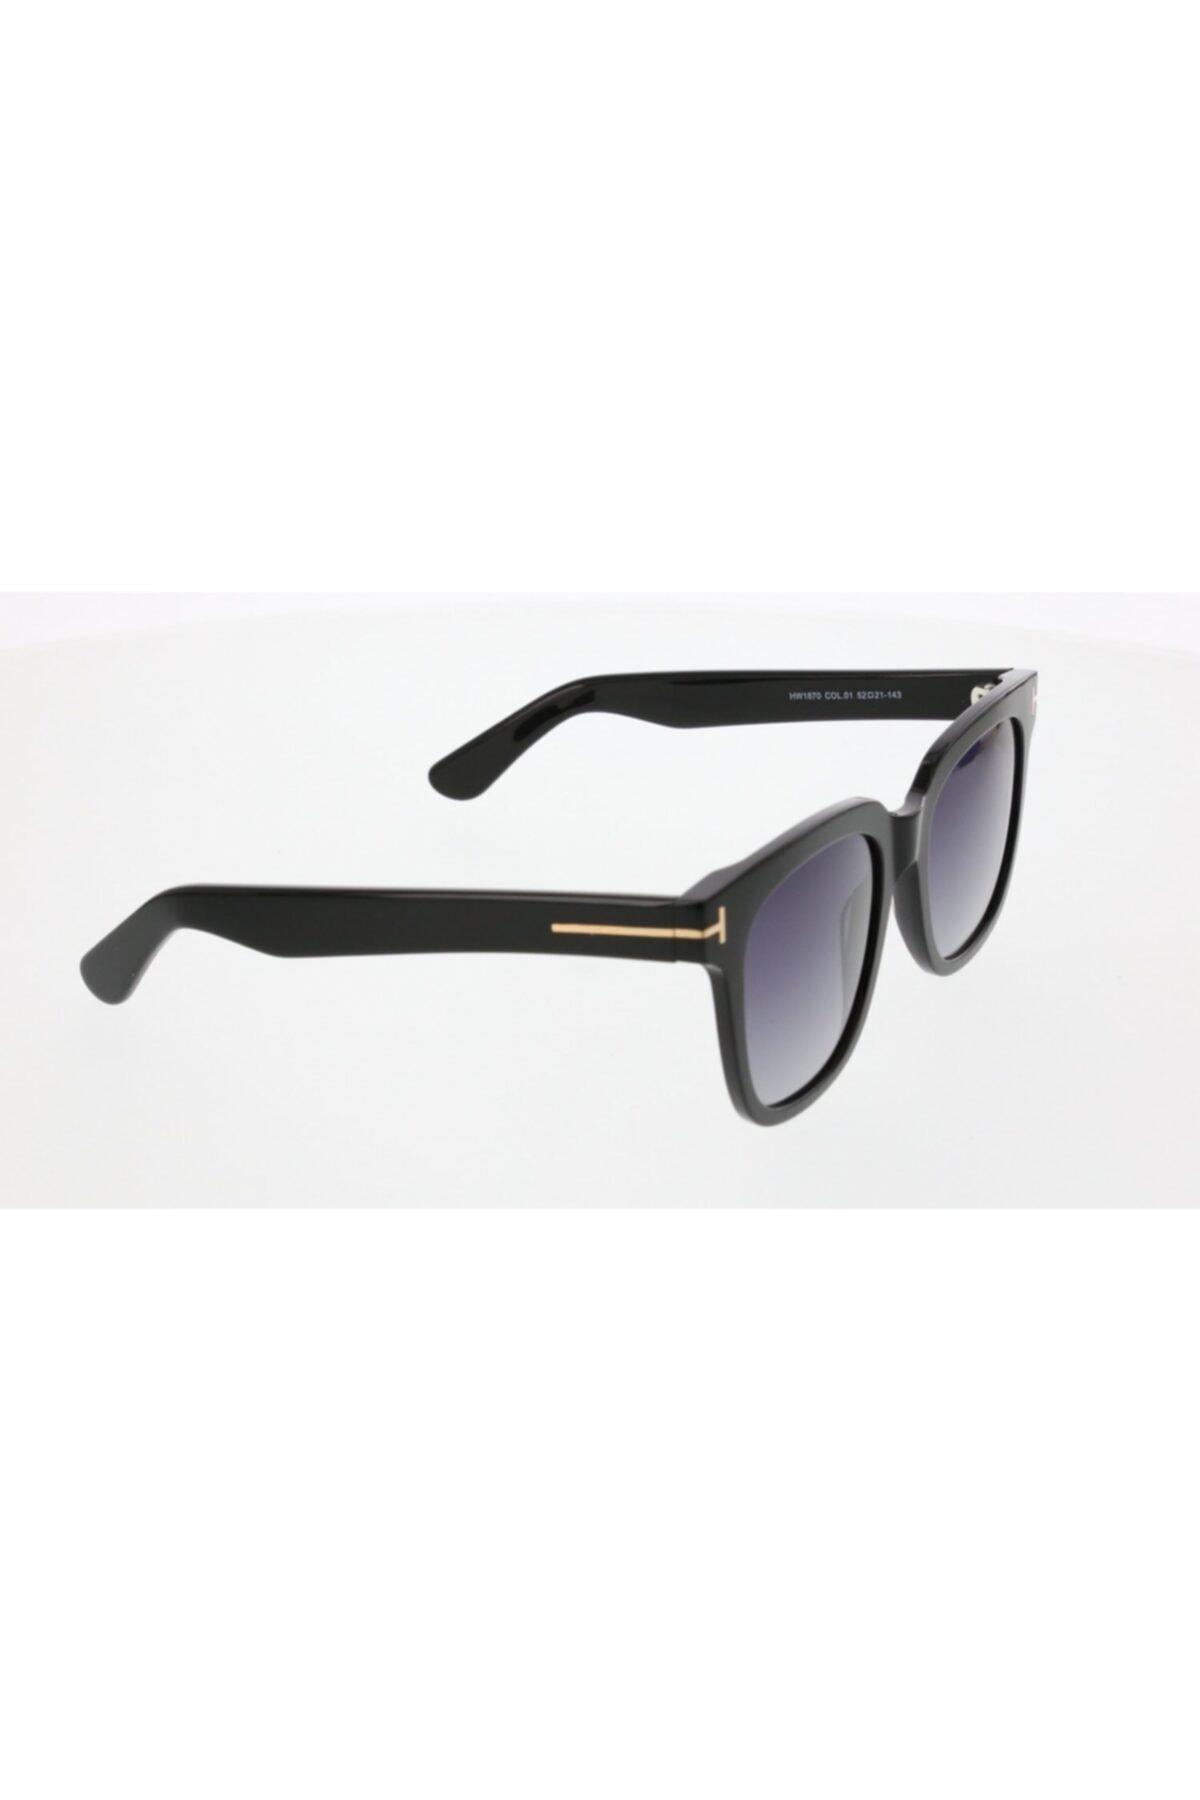 عینک آفتابی یونیسکس شیک مجلسی برند HAWK رنگ مشکی کد ty35106883